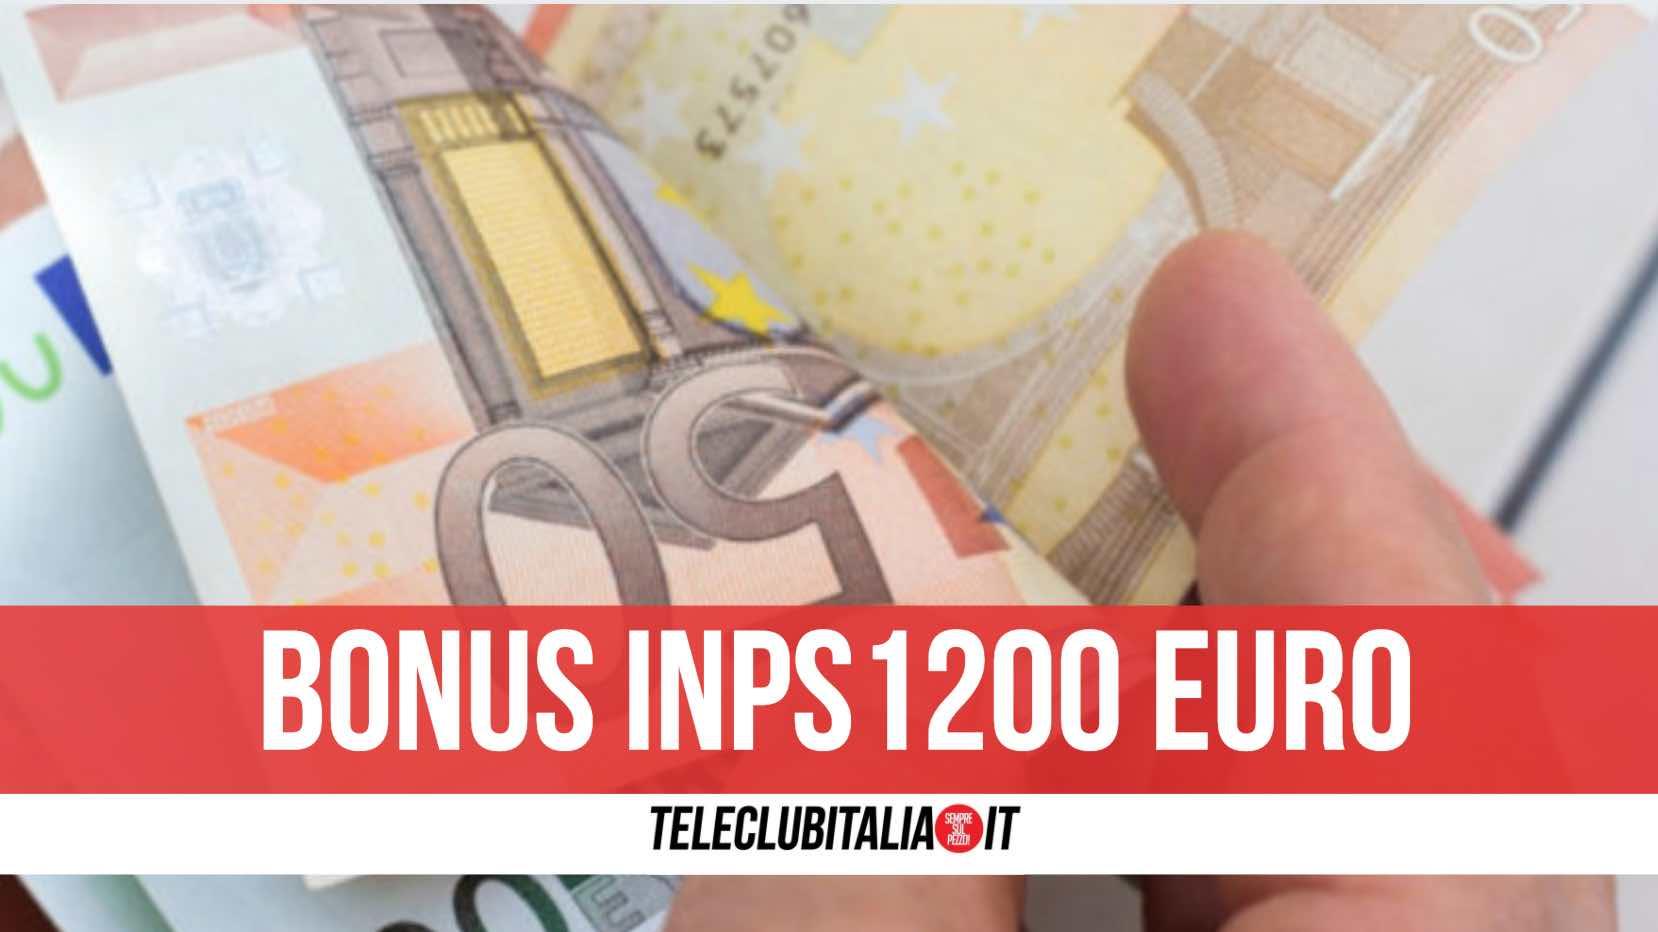 bonus inps 1200 euro